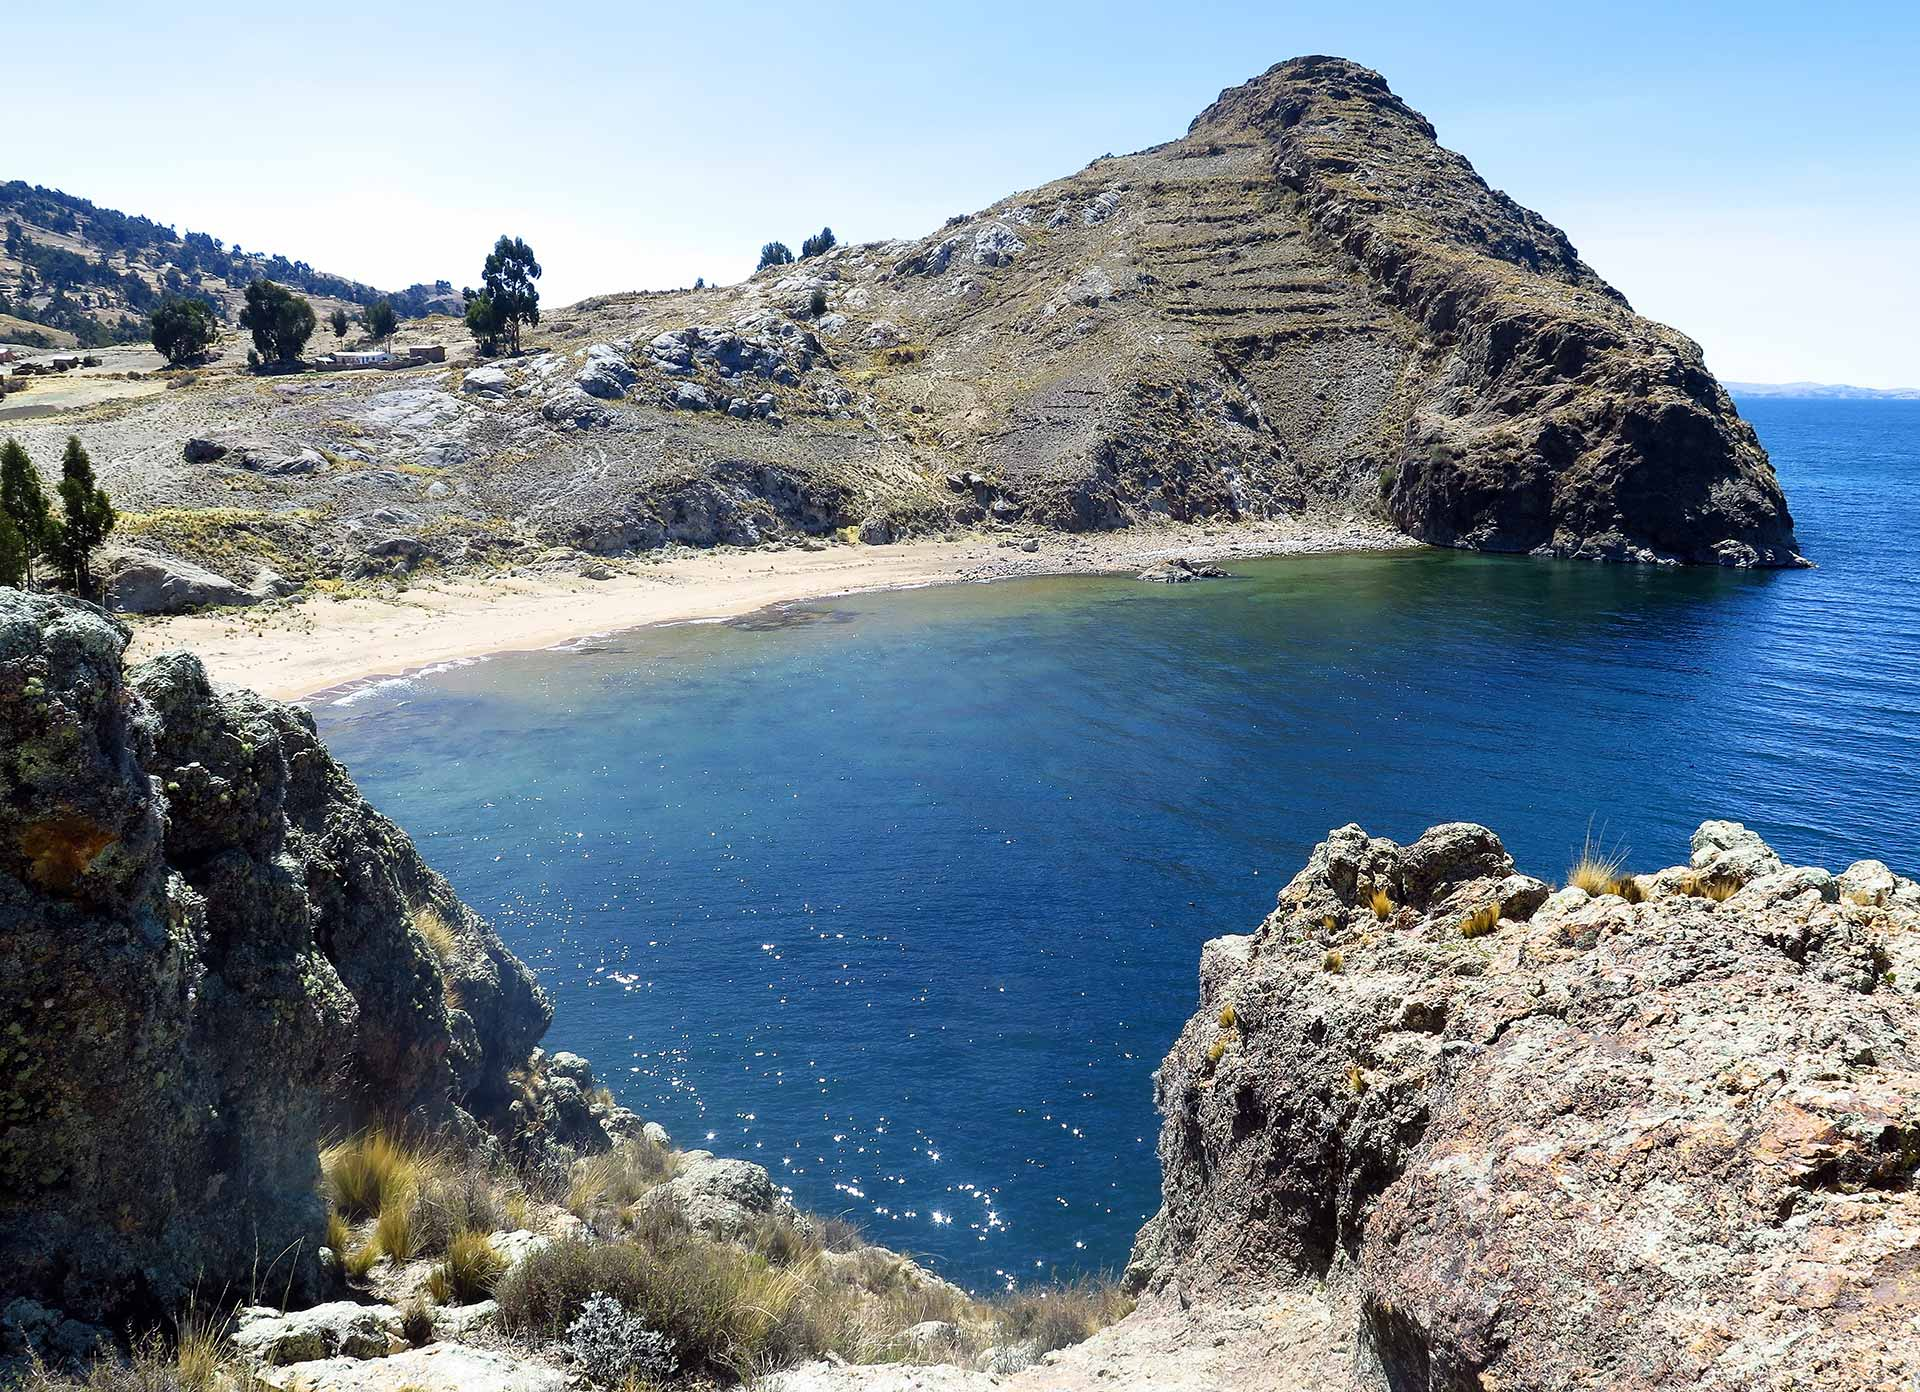 Inolvidable estancia a orillas del lago Titicaca